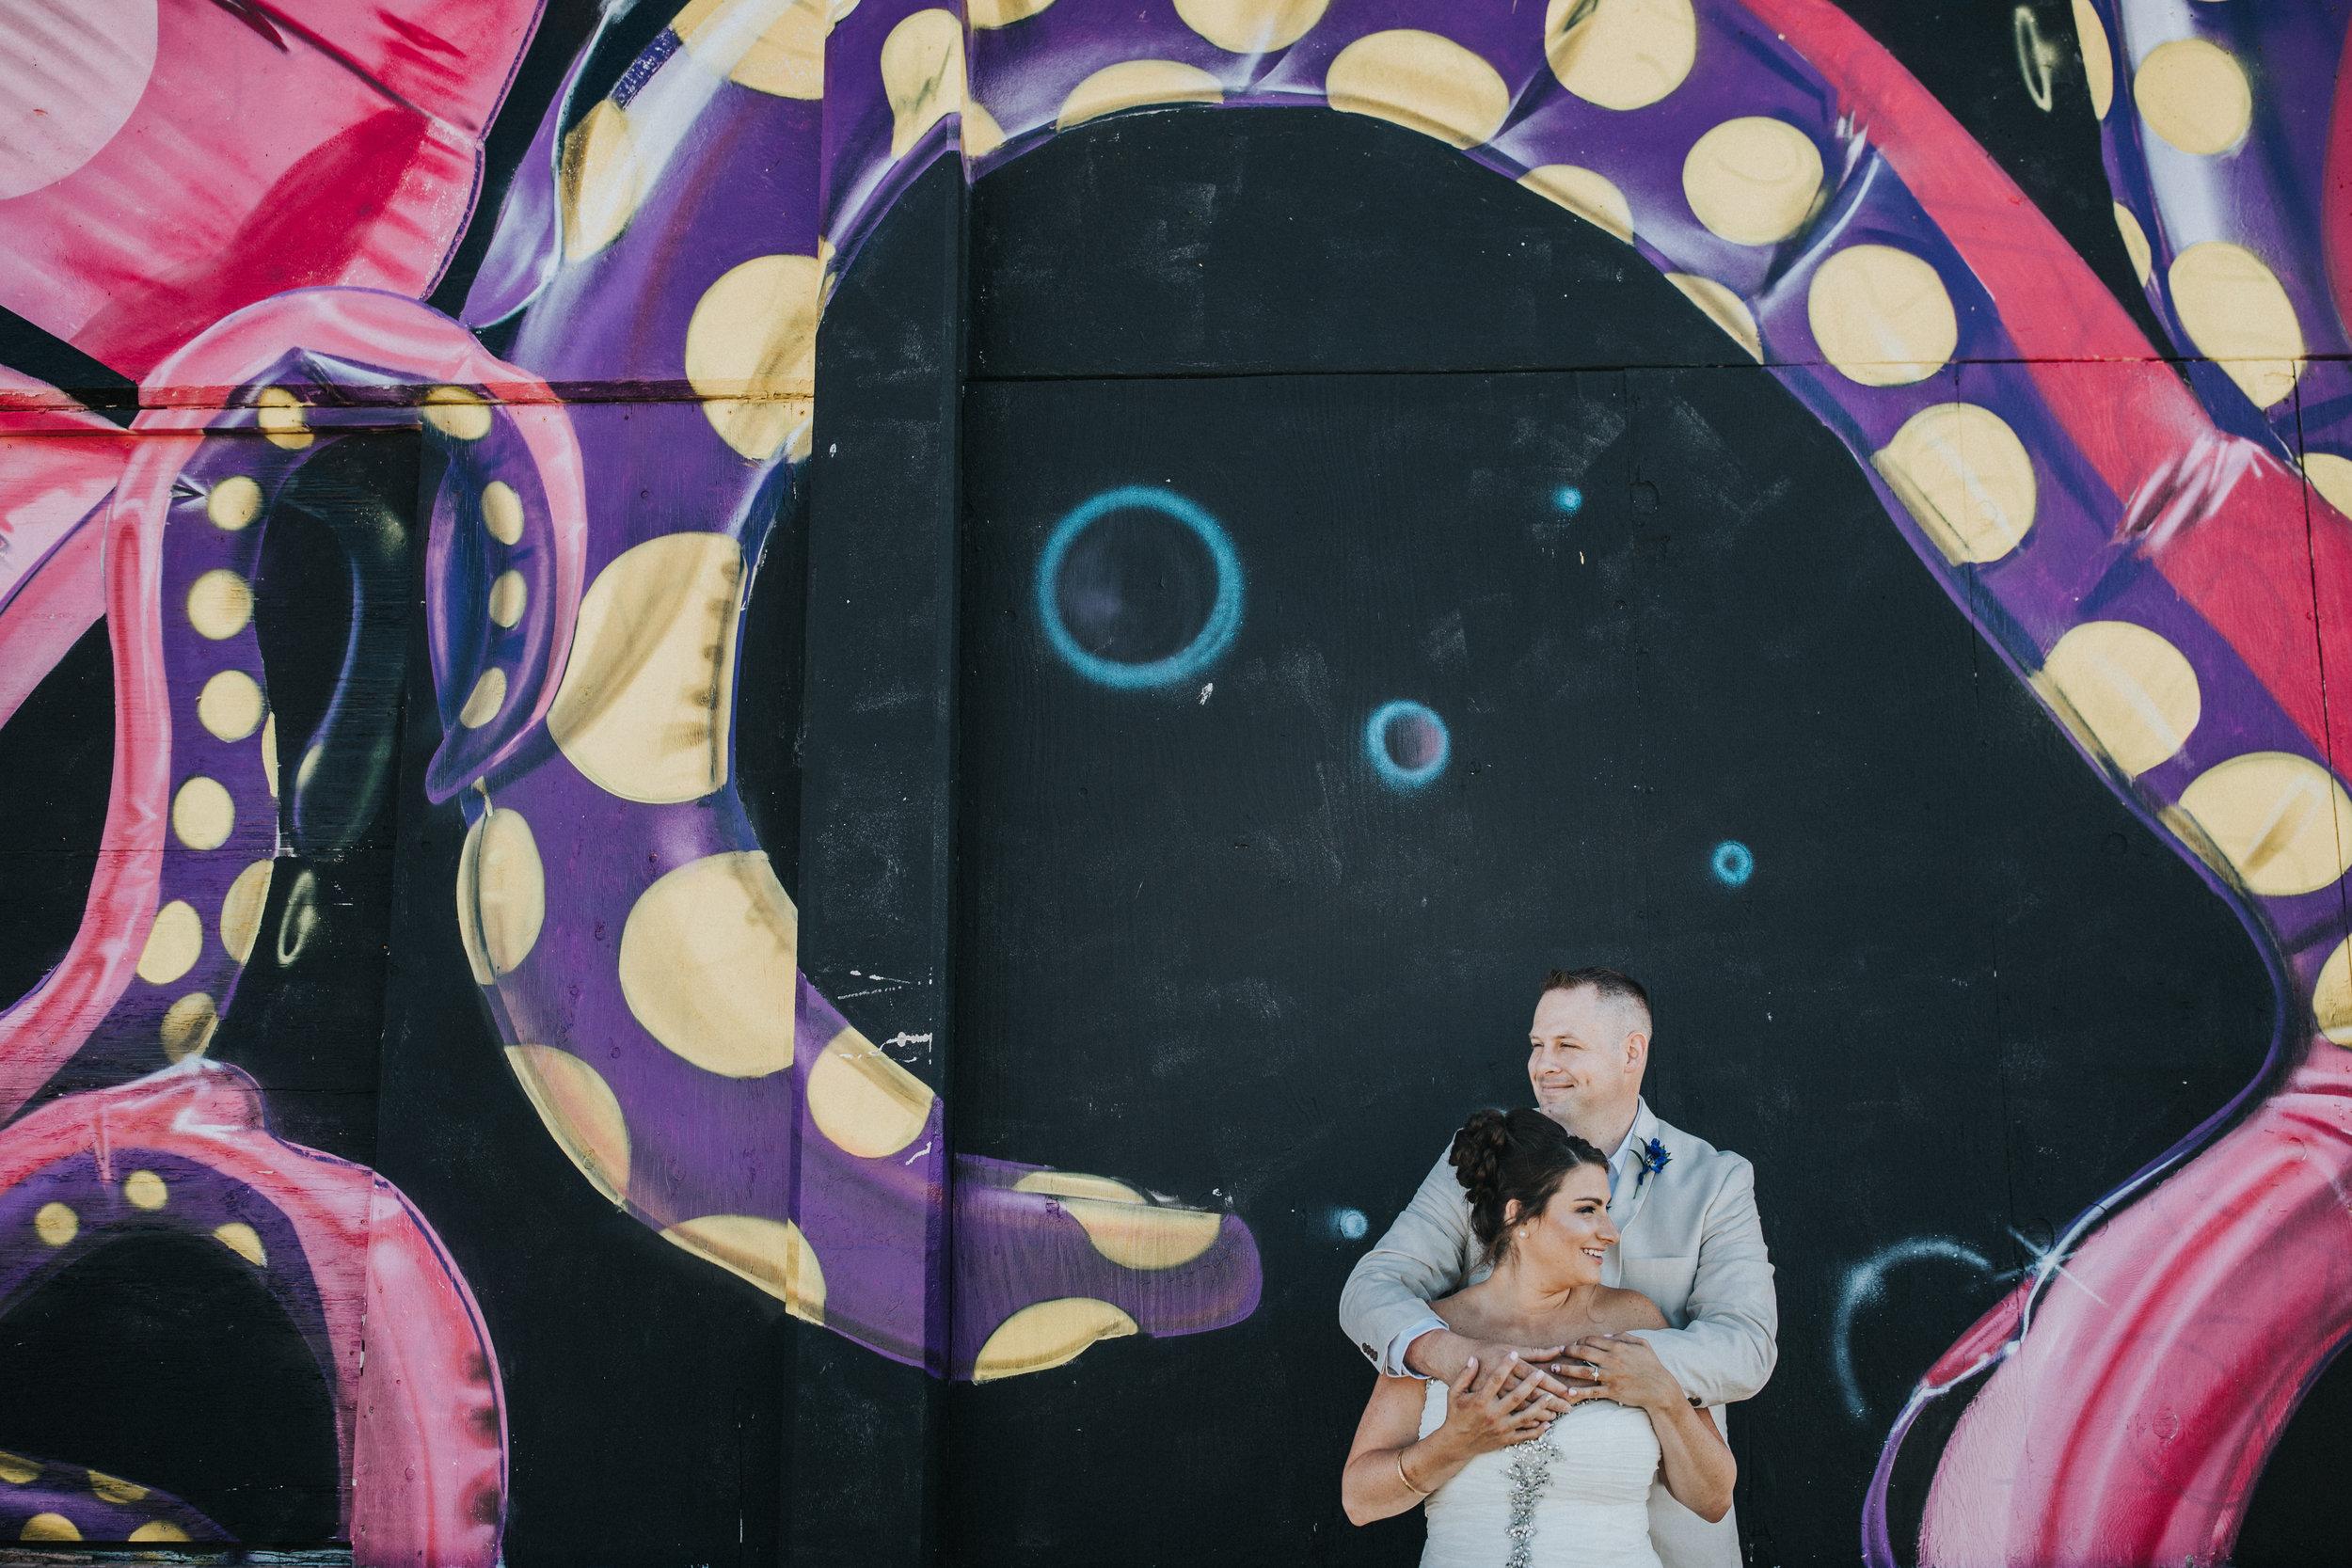 JennaLynnPhotography-NJWeddingPhotographer-Wedding-TheBerkeley-AsburyPark-Allison&Michael-Bride&Groom-36.jpg